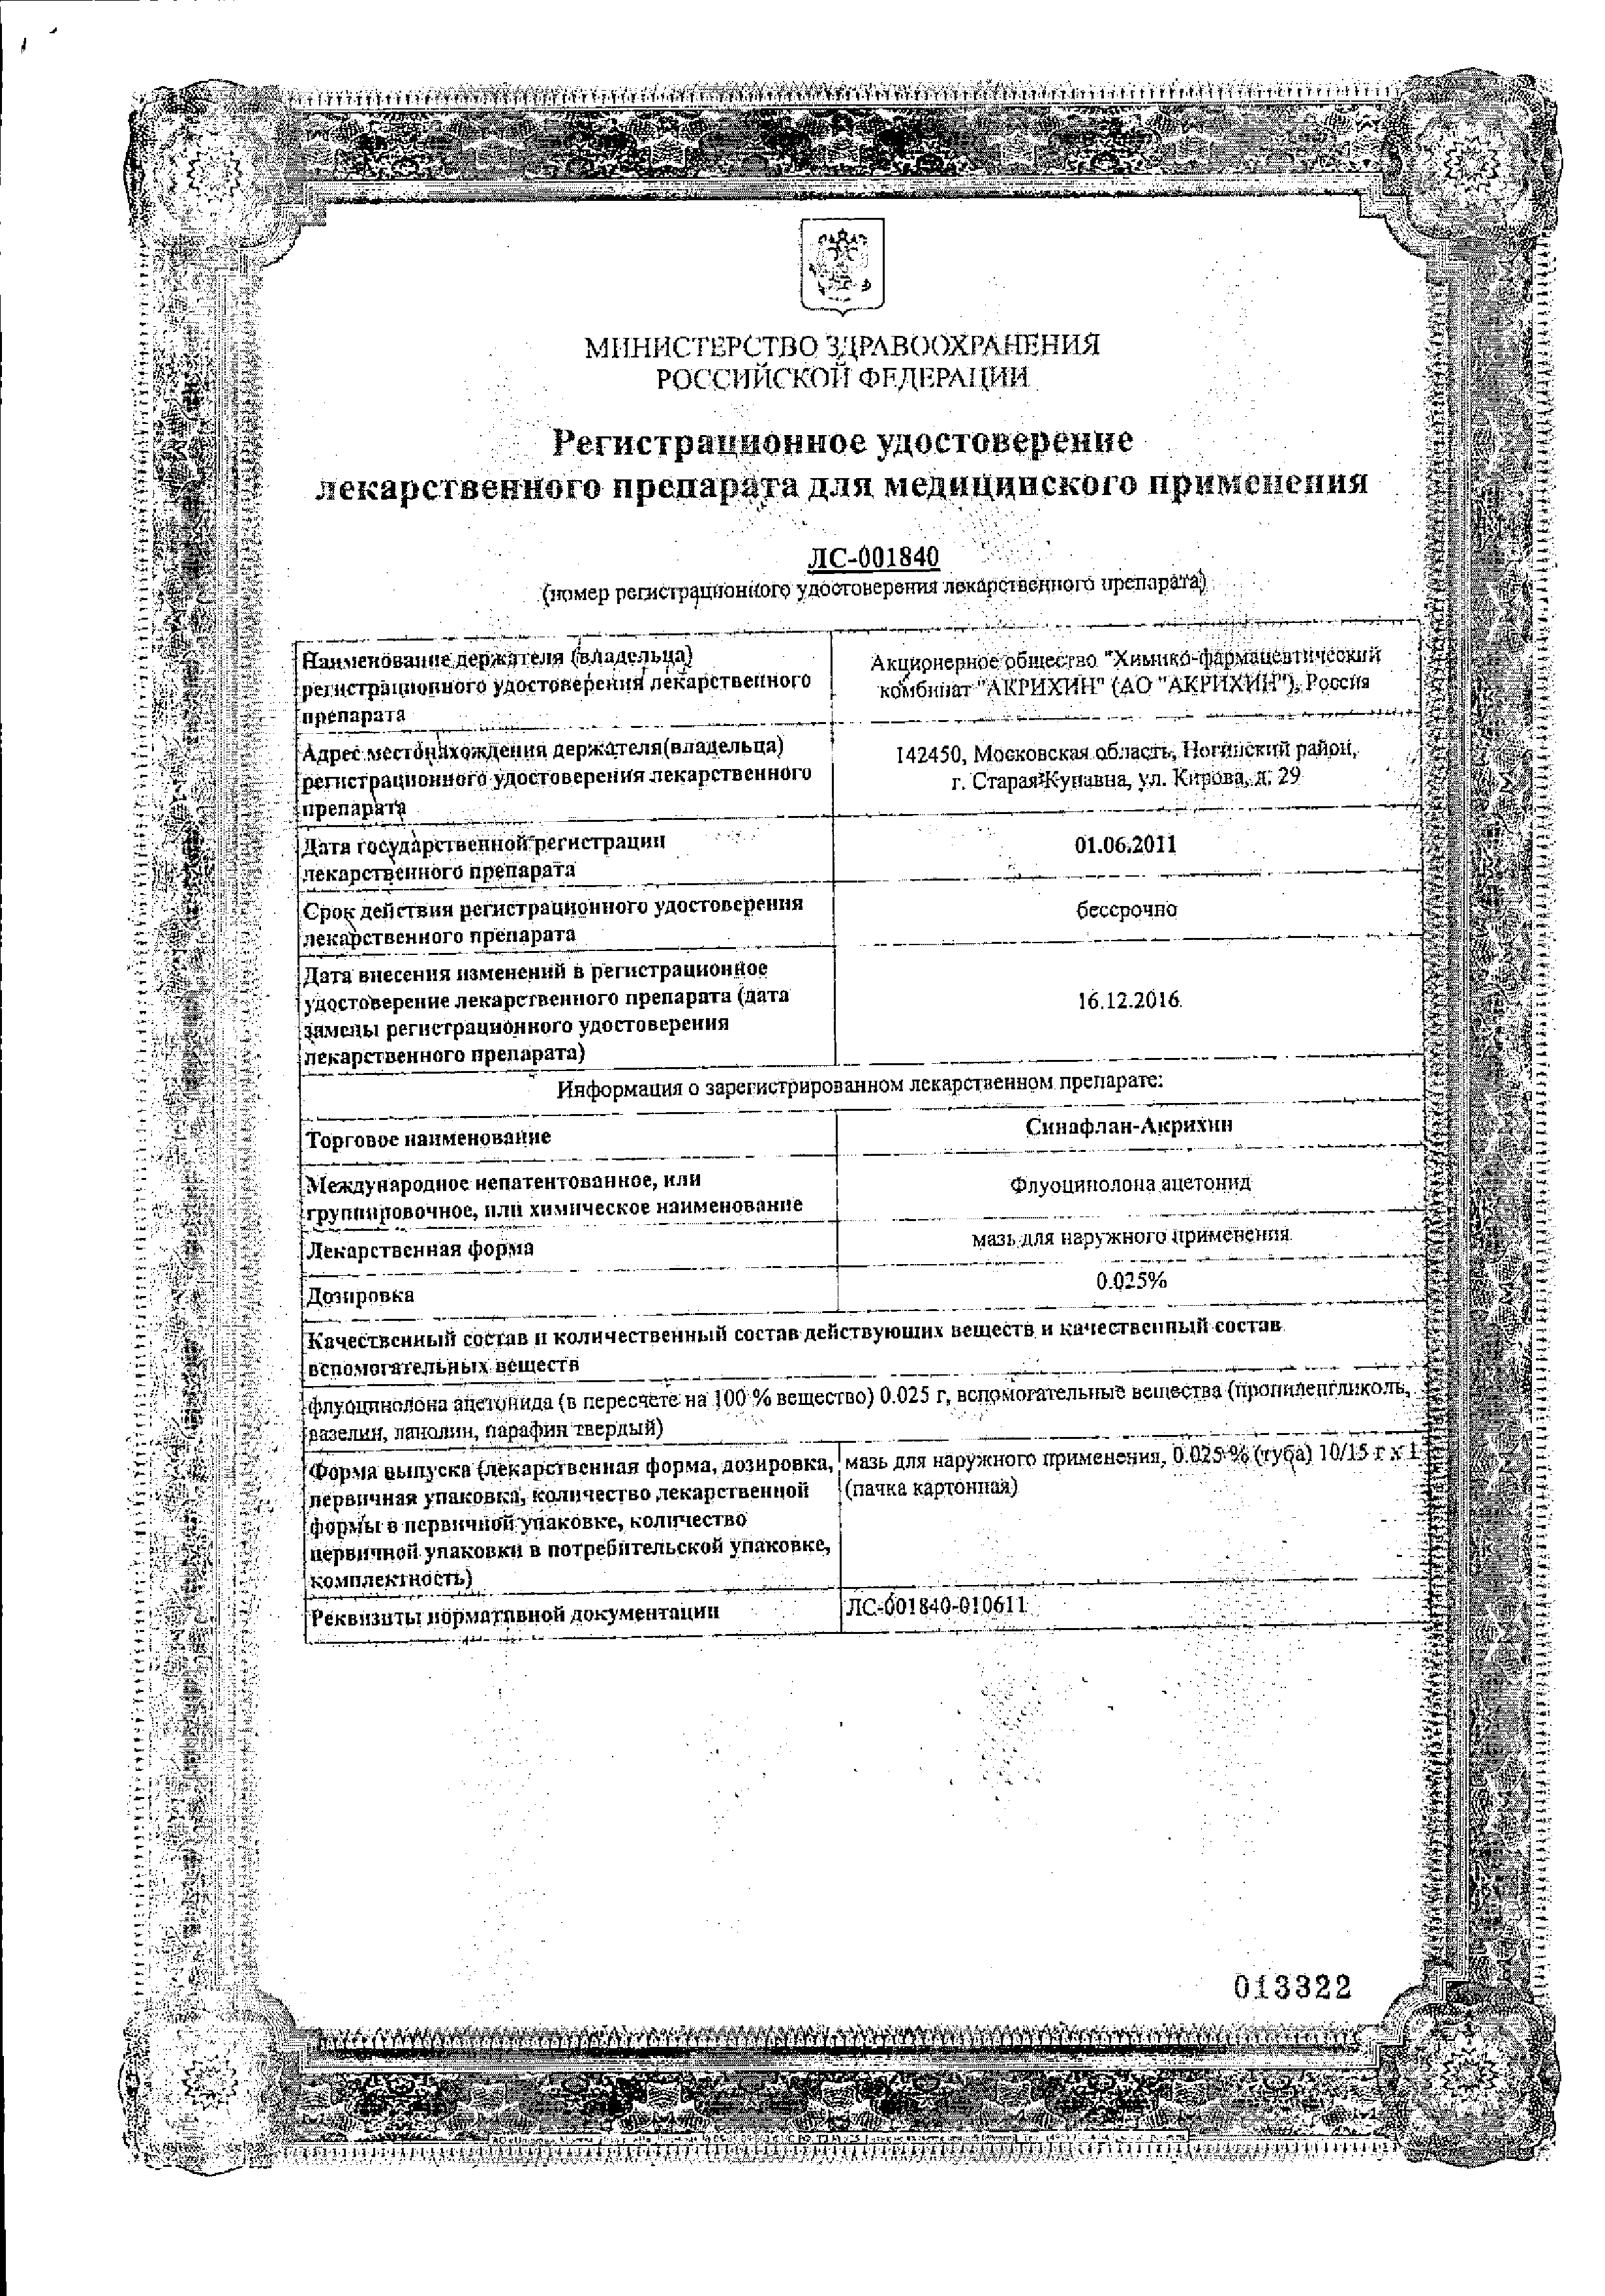 Синафлан-Акрихин